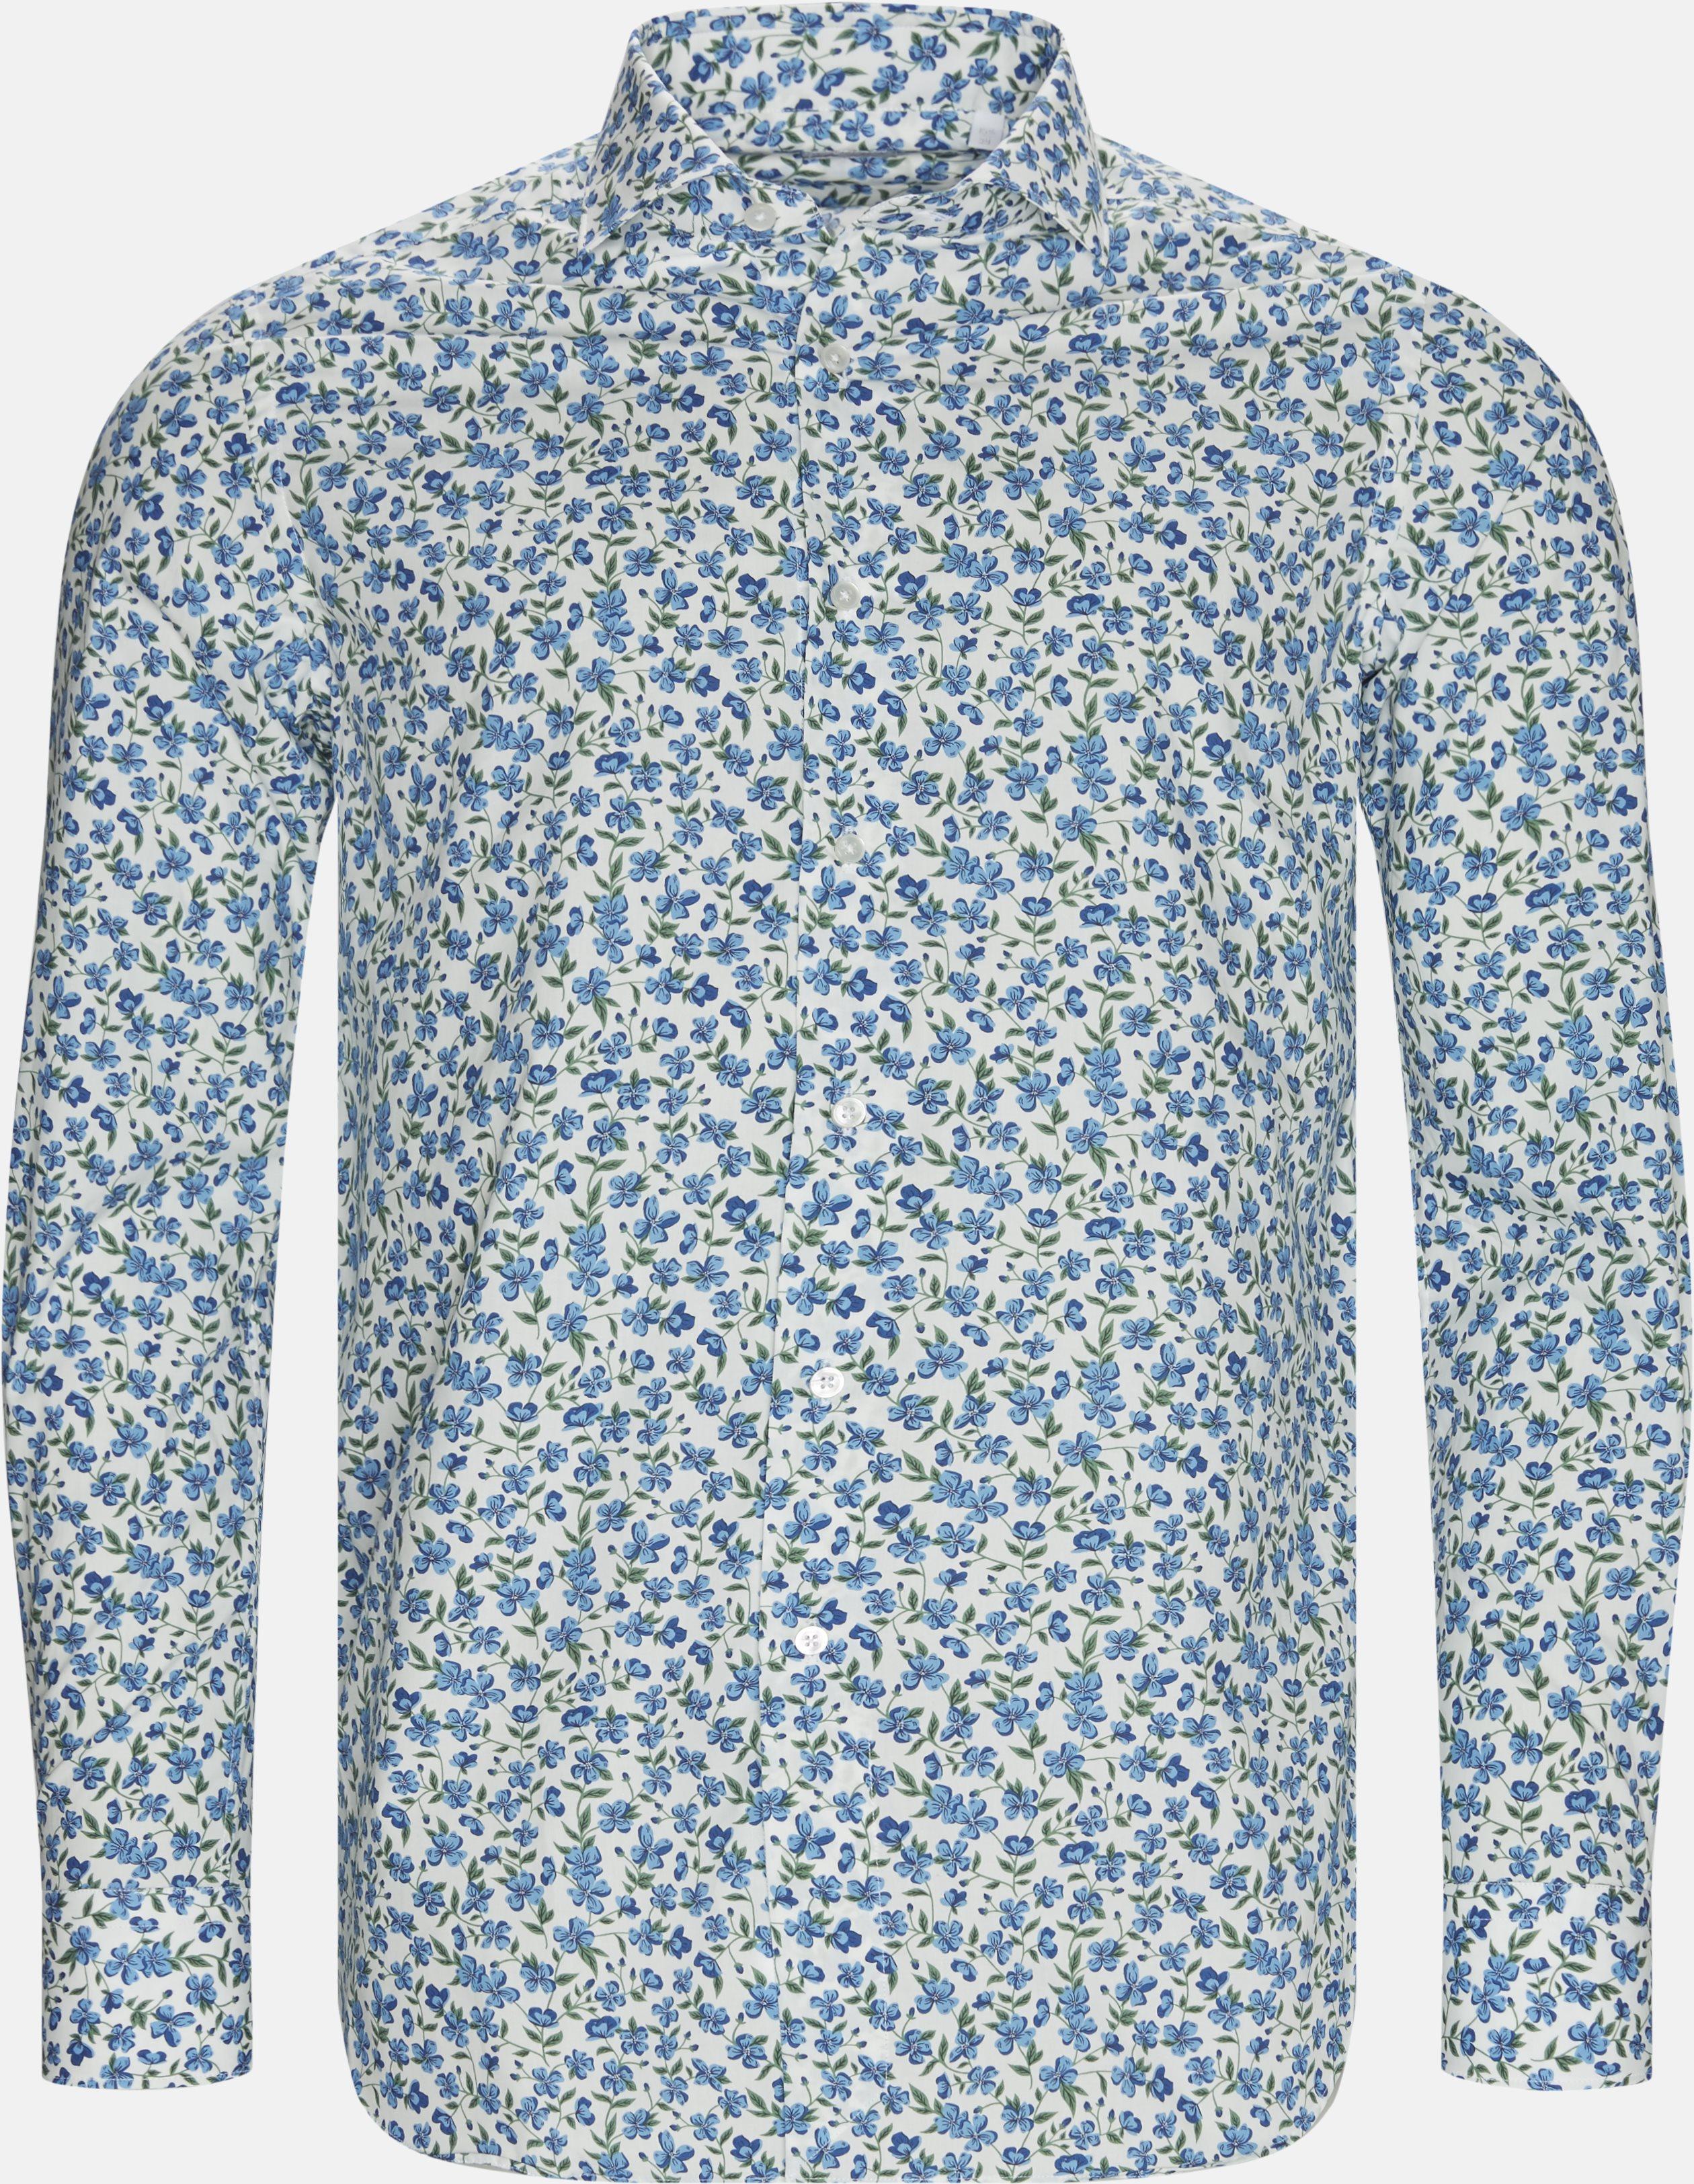 Shirts - Tailor - Multi